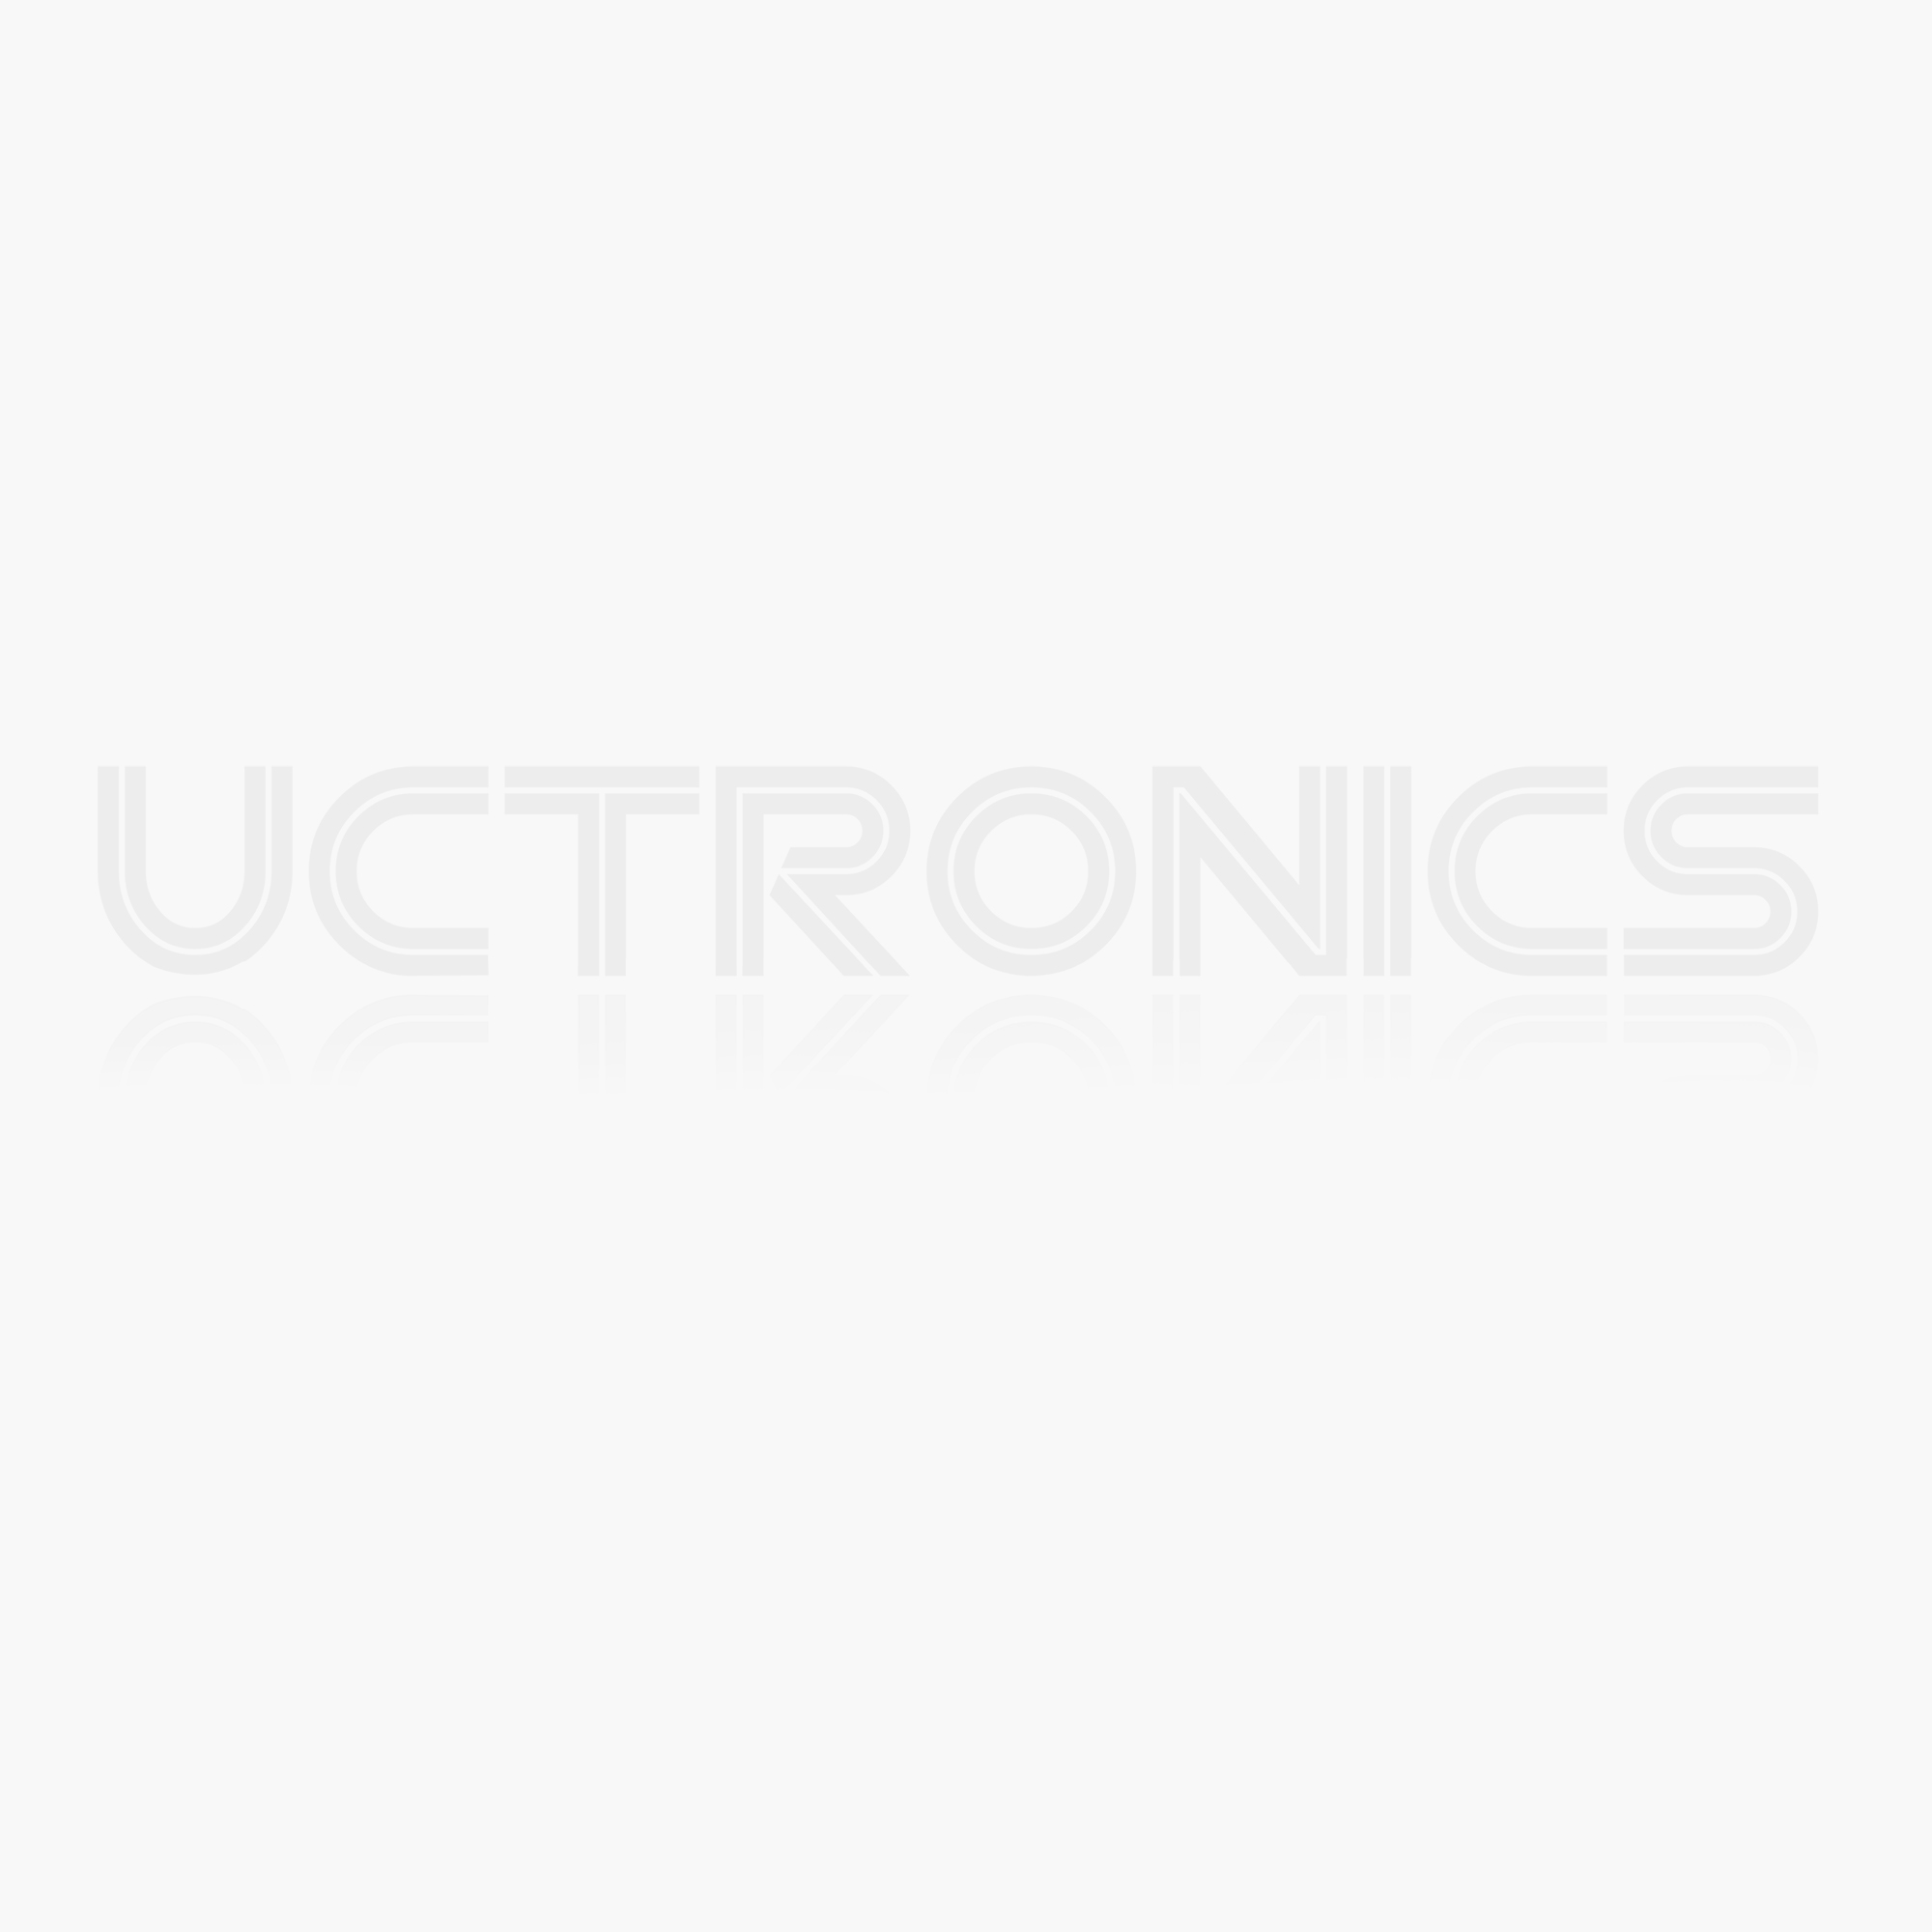 3.3V 5V Ceramic Piezo Vibration Sensor Analog 30mm*23mm for Arduino